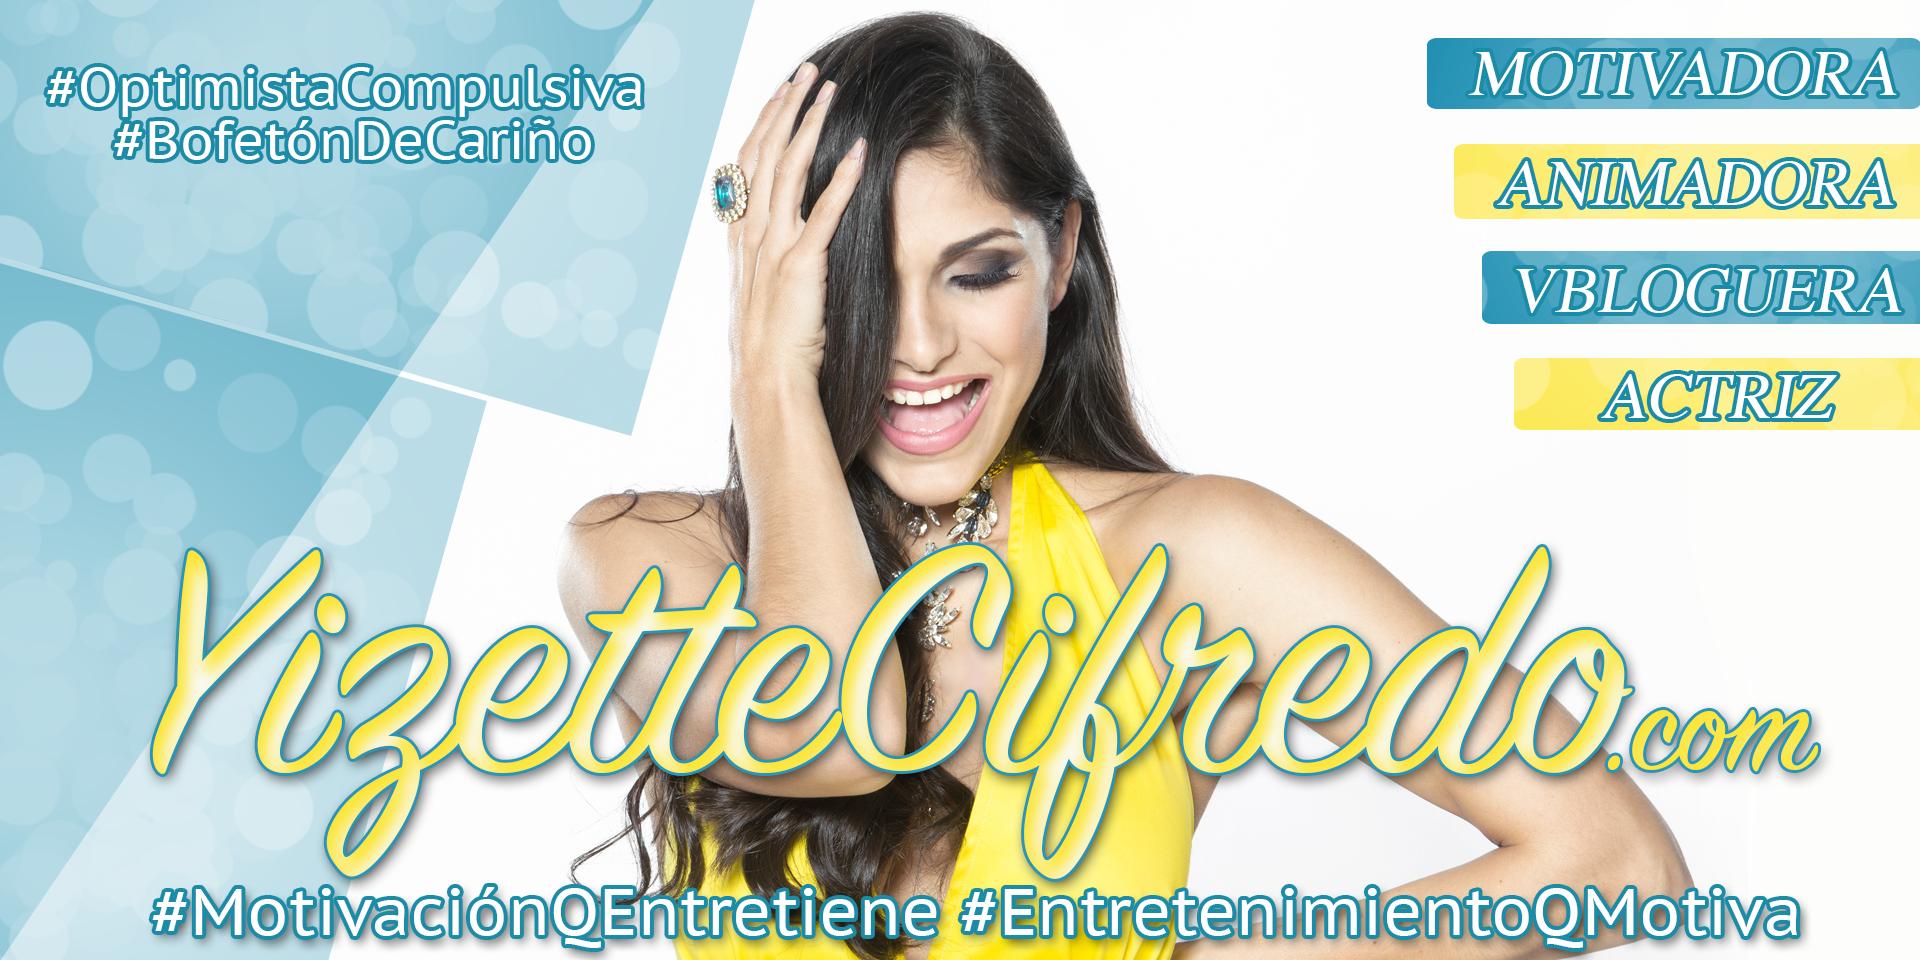 YizetteCifredo.com